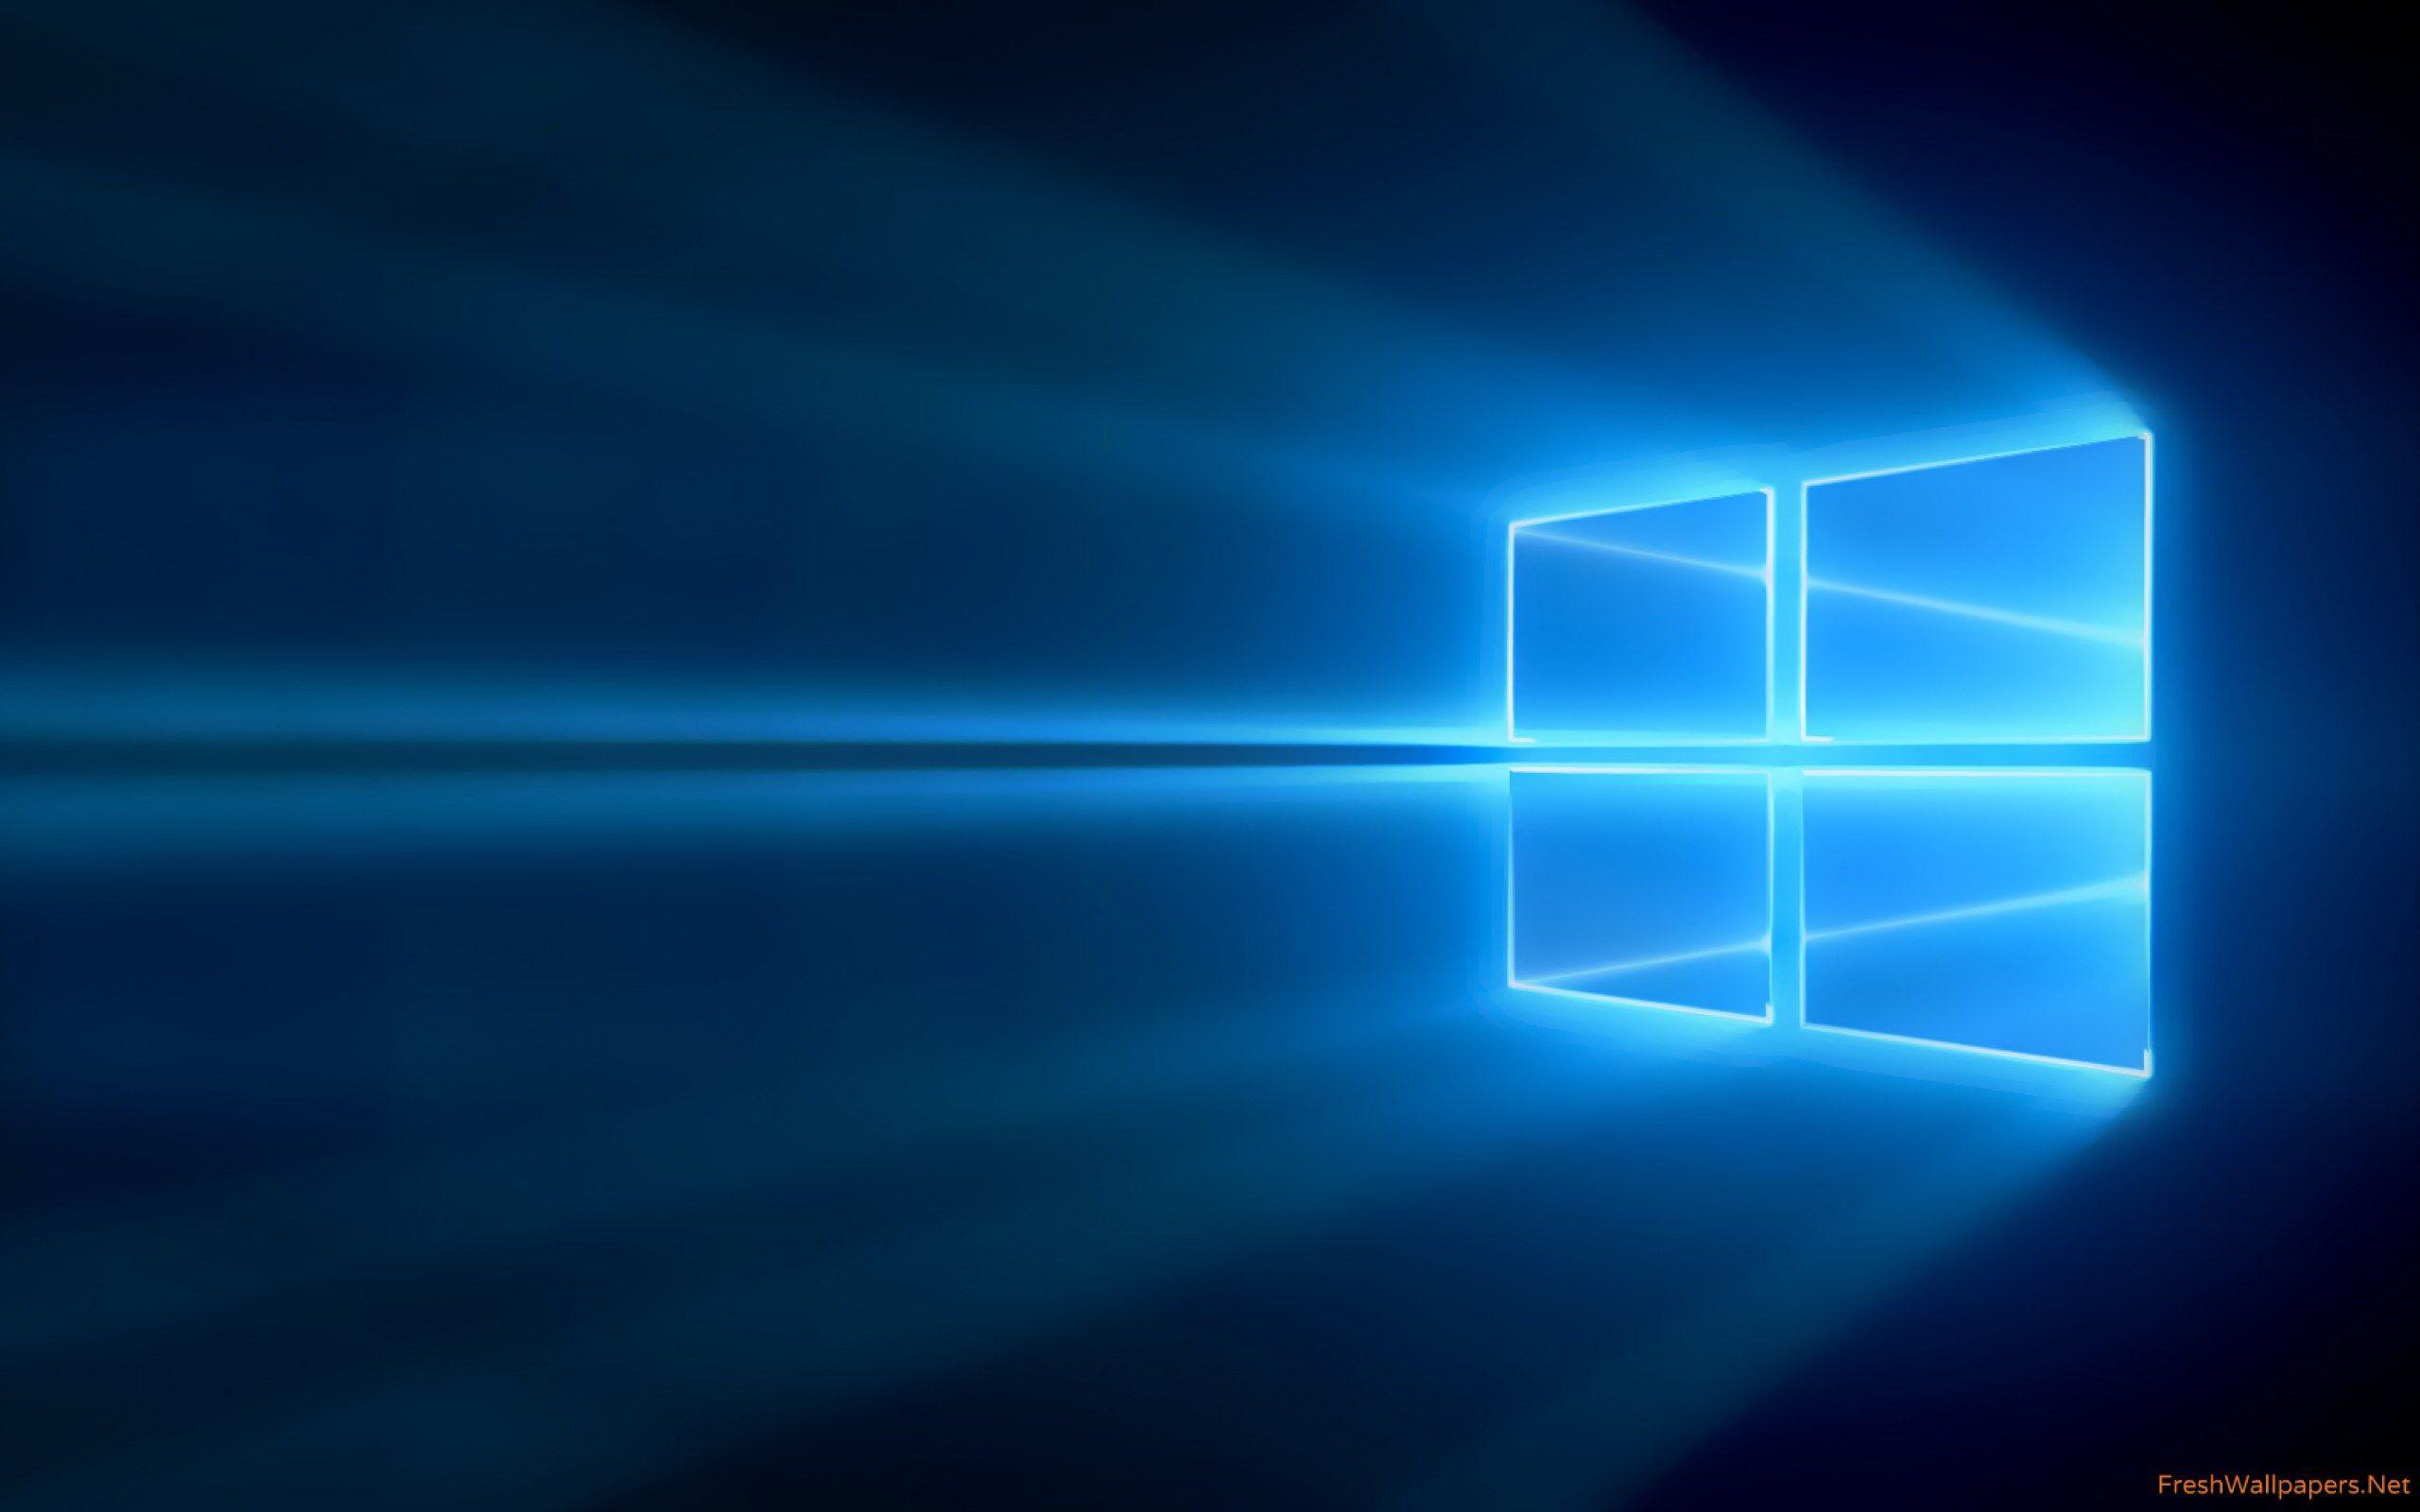 Most Beautiful Windows 10 Wallpaper Microsoft Wallpaper Windows 10 Desktop Backgrounds Windows 10